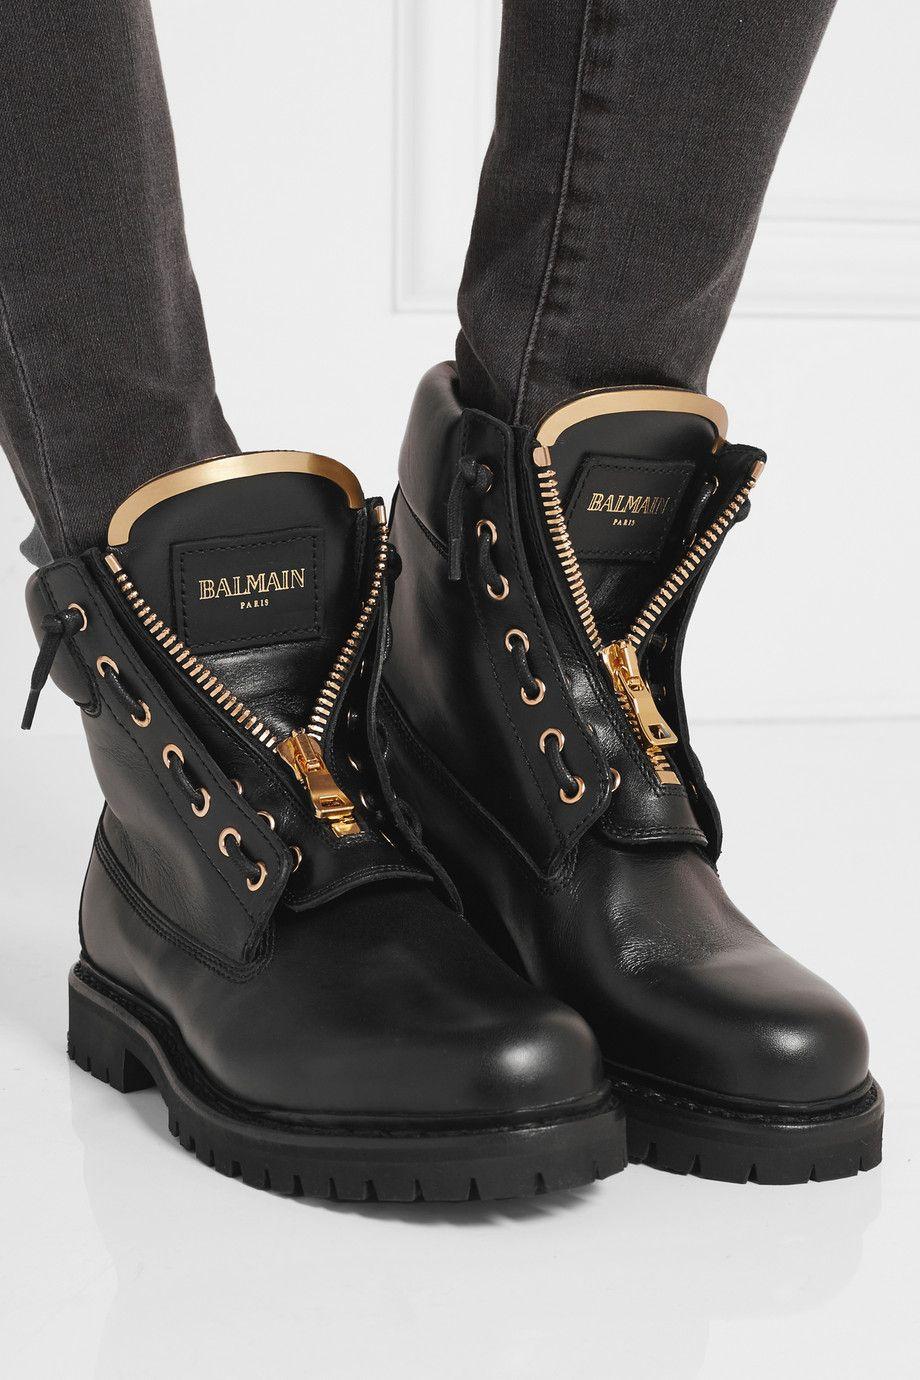 Balmain Rangers En Cuir Net A Portercom Shoe Lust